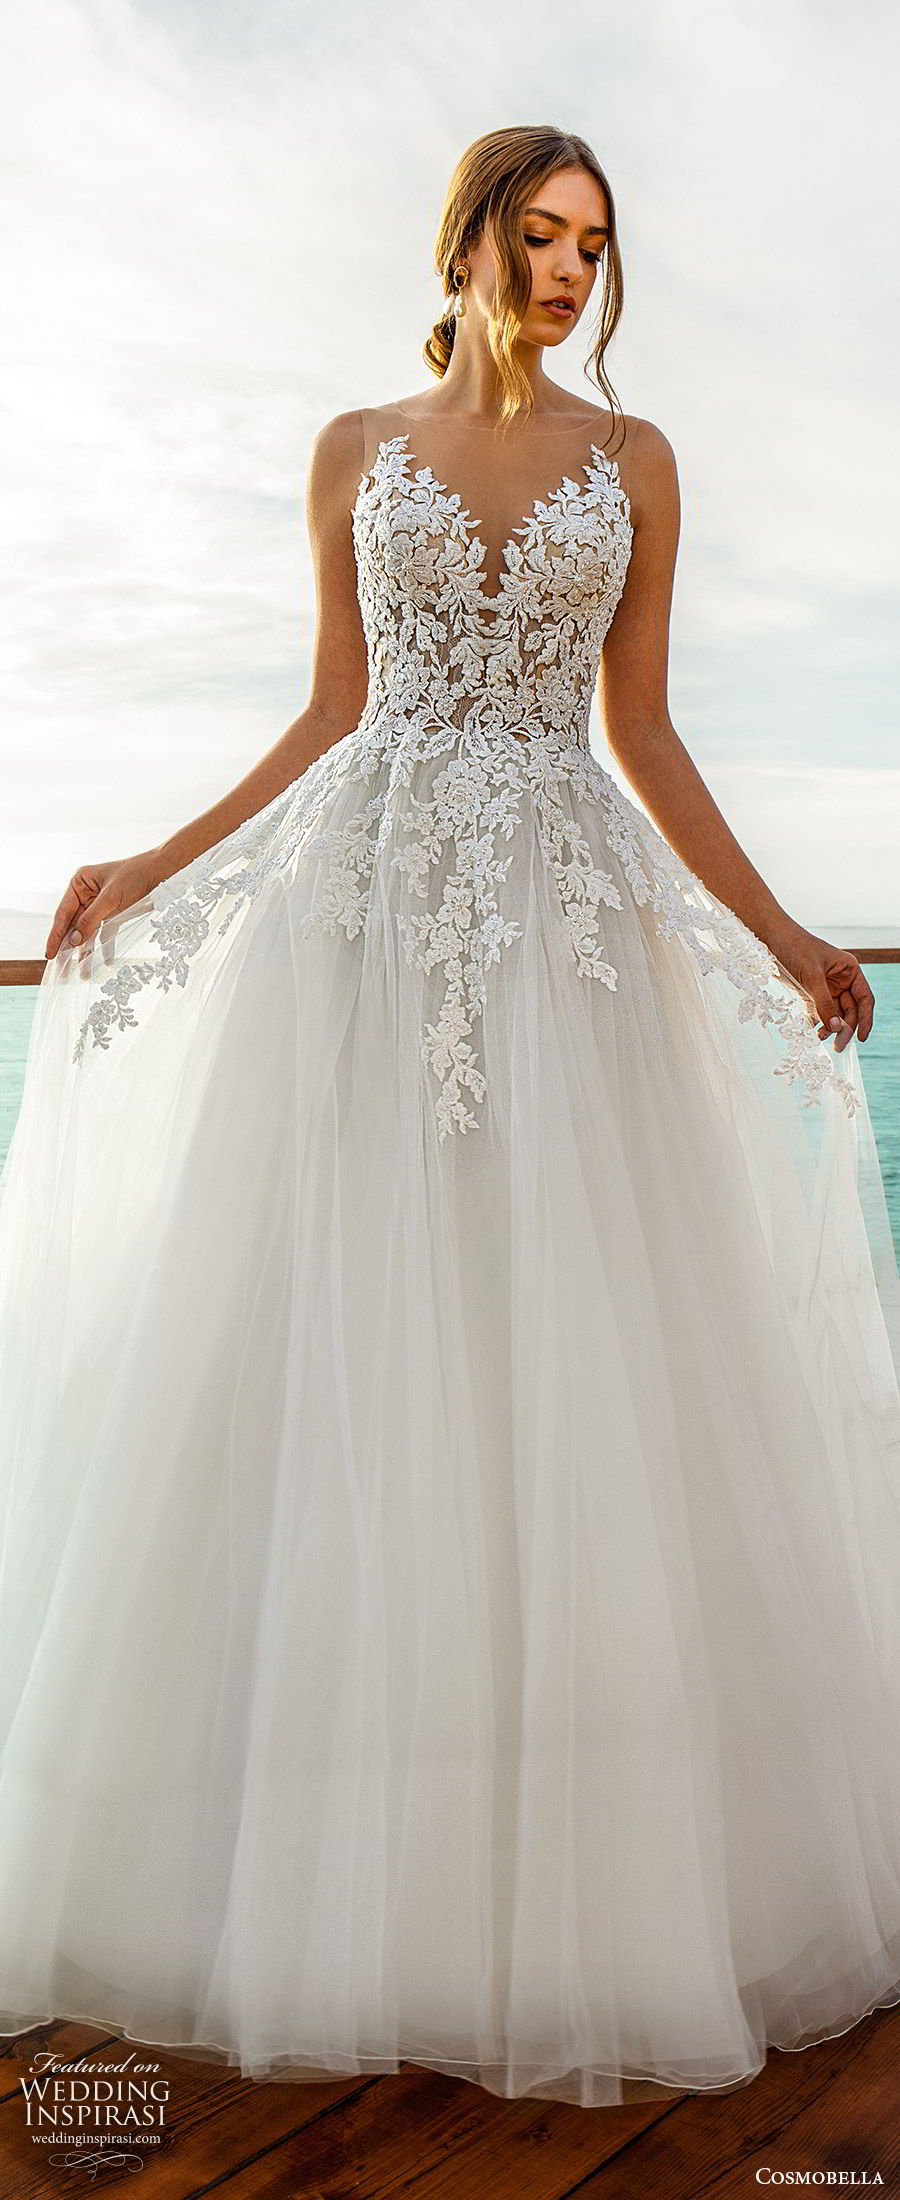 cosmobella 2020 bridal sleeveless illusion bateau neckline sweetheart embellished bodice a line ball gown wedding dress (15) romantic princess chapel train mv